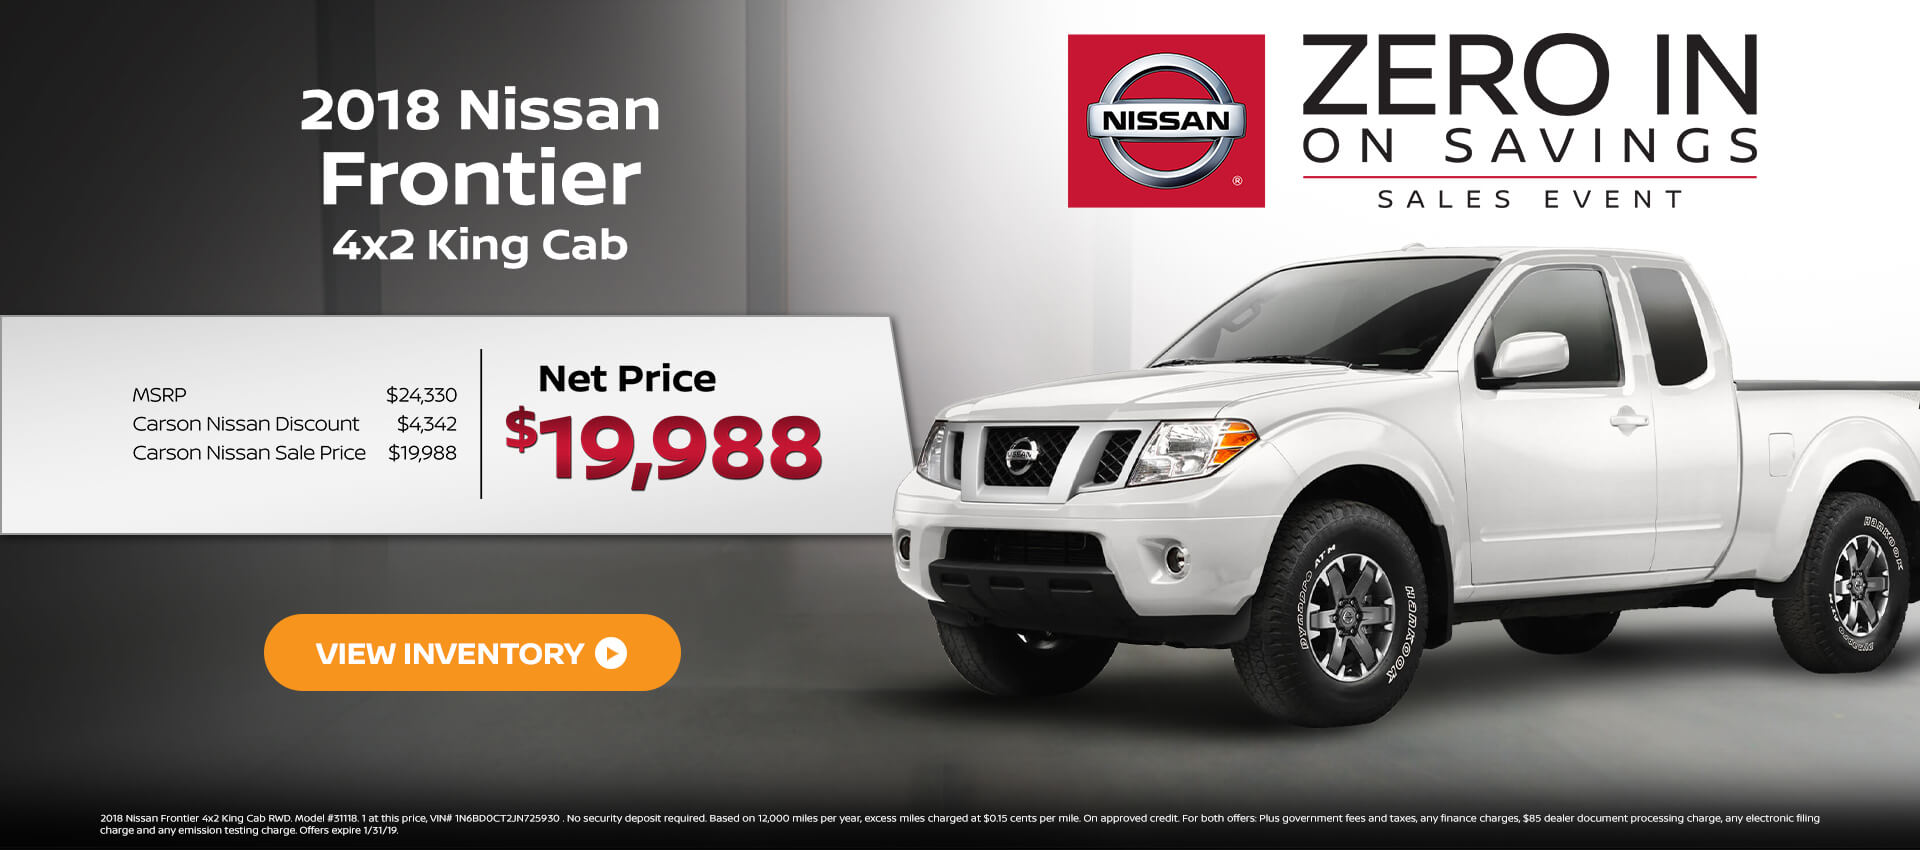 2018 Nissan Frontier 4x2 KC